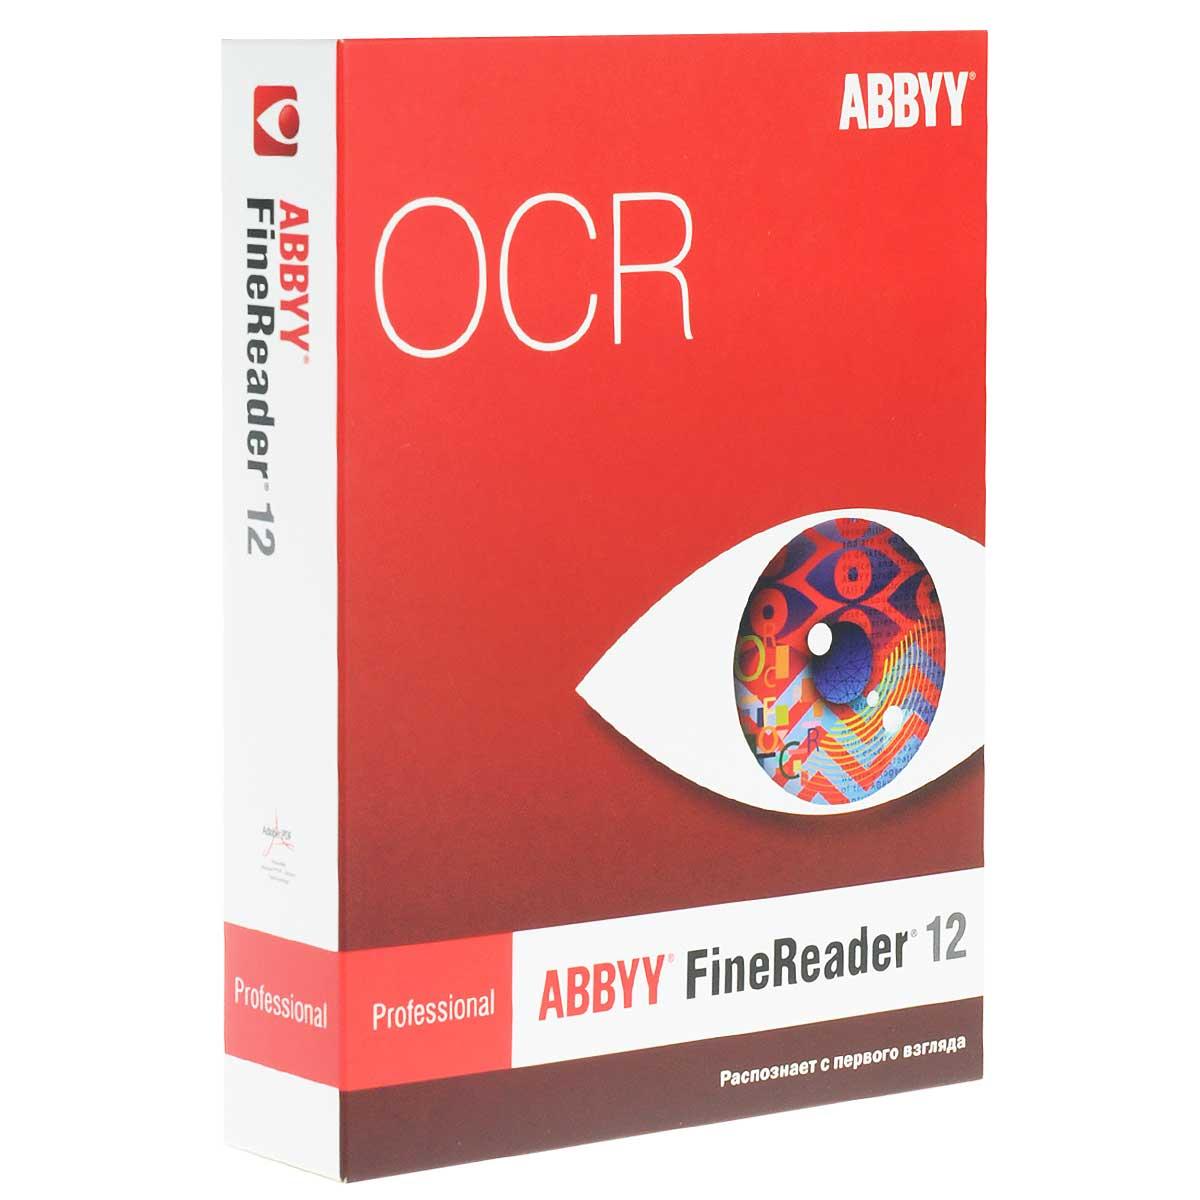 ABBYY FineReader 12 Professional Edition Full